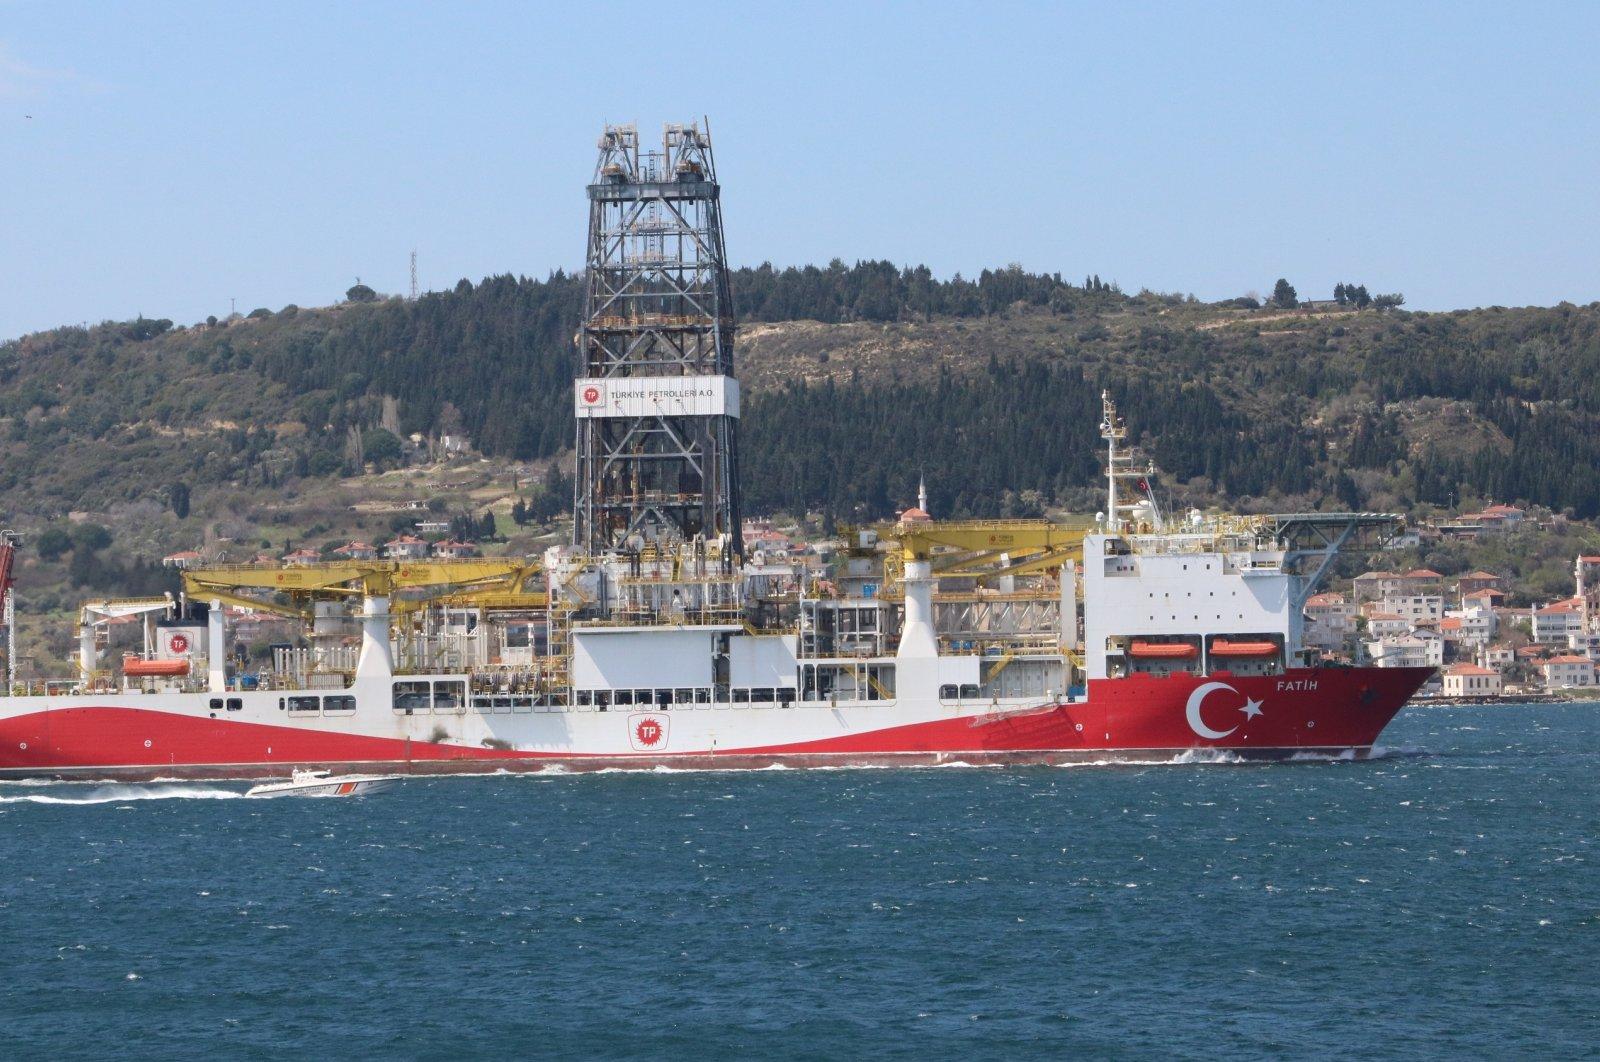 The Fatih drillship passes through the Dardanelles strait en route to the Black Sea, Çanakkale province, northwestern Turkey, April 8, 2020. (DHA Photo)